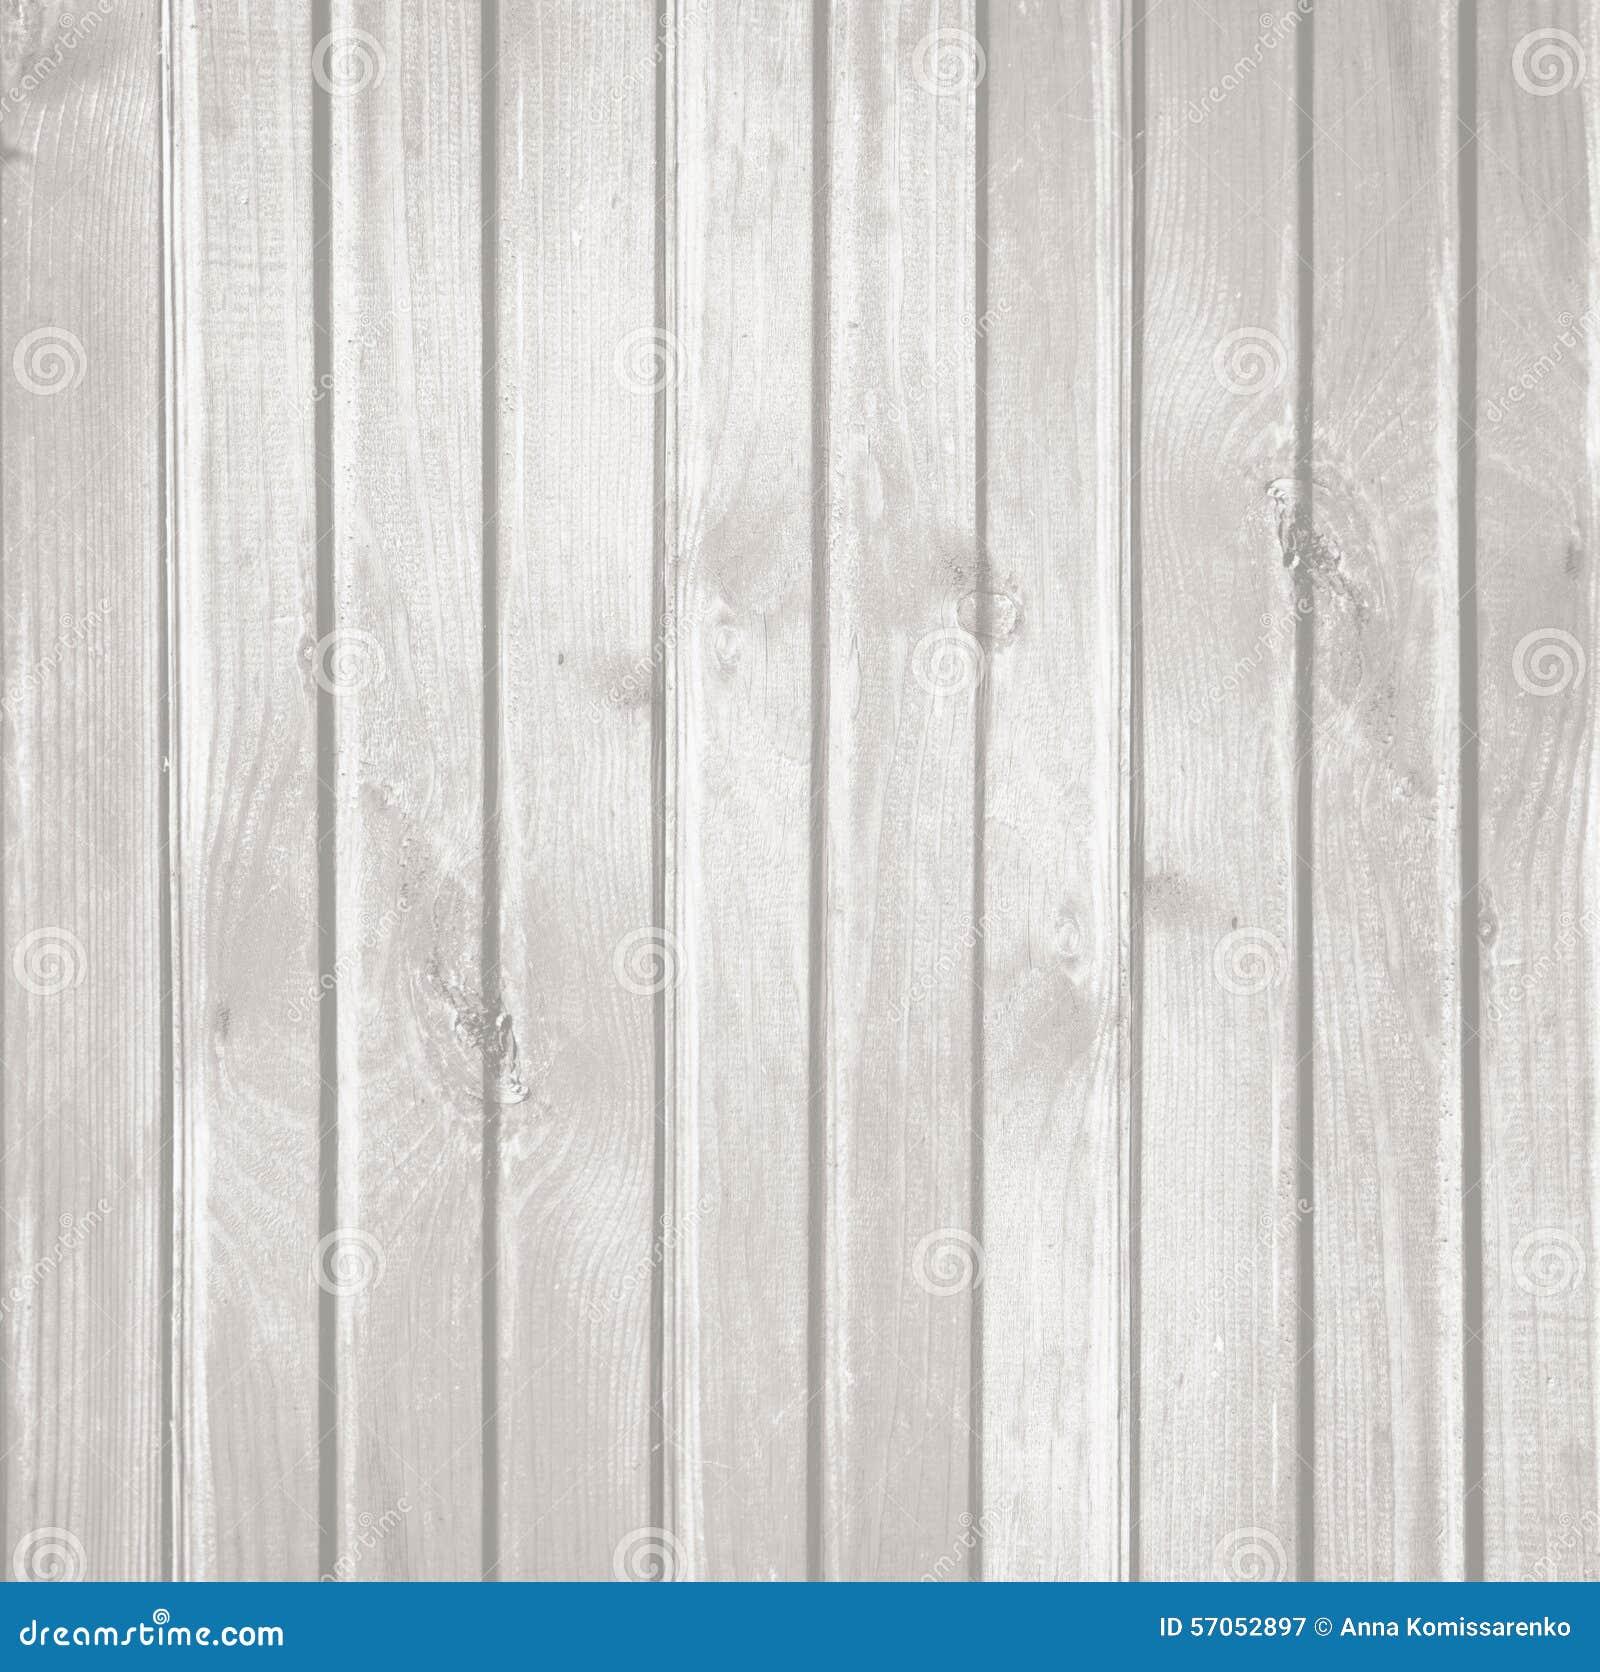 Wood Shabby Chic Texture Stock Photo Image 57052897